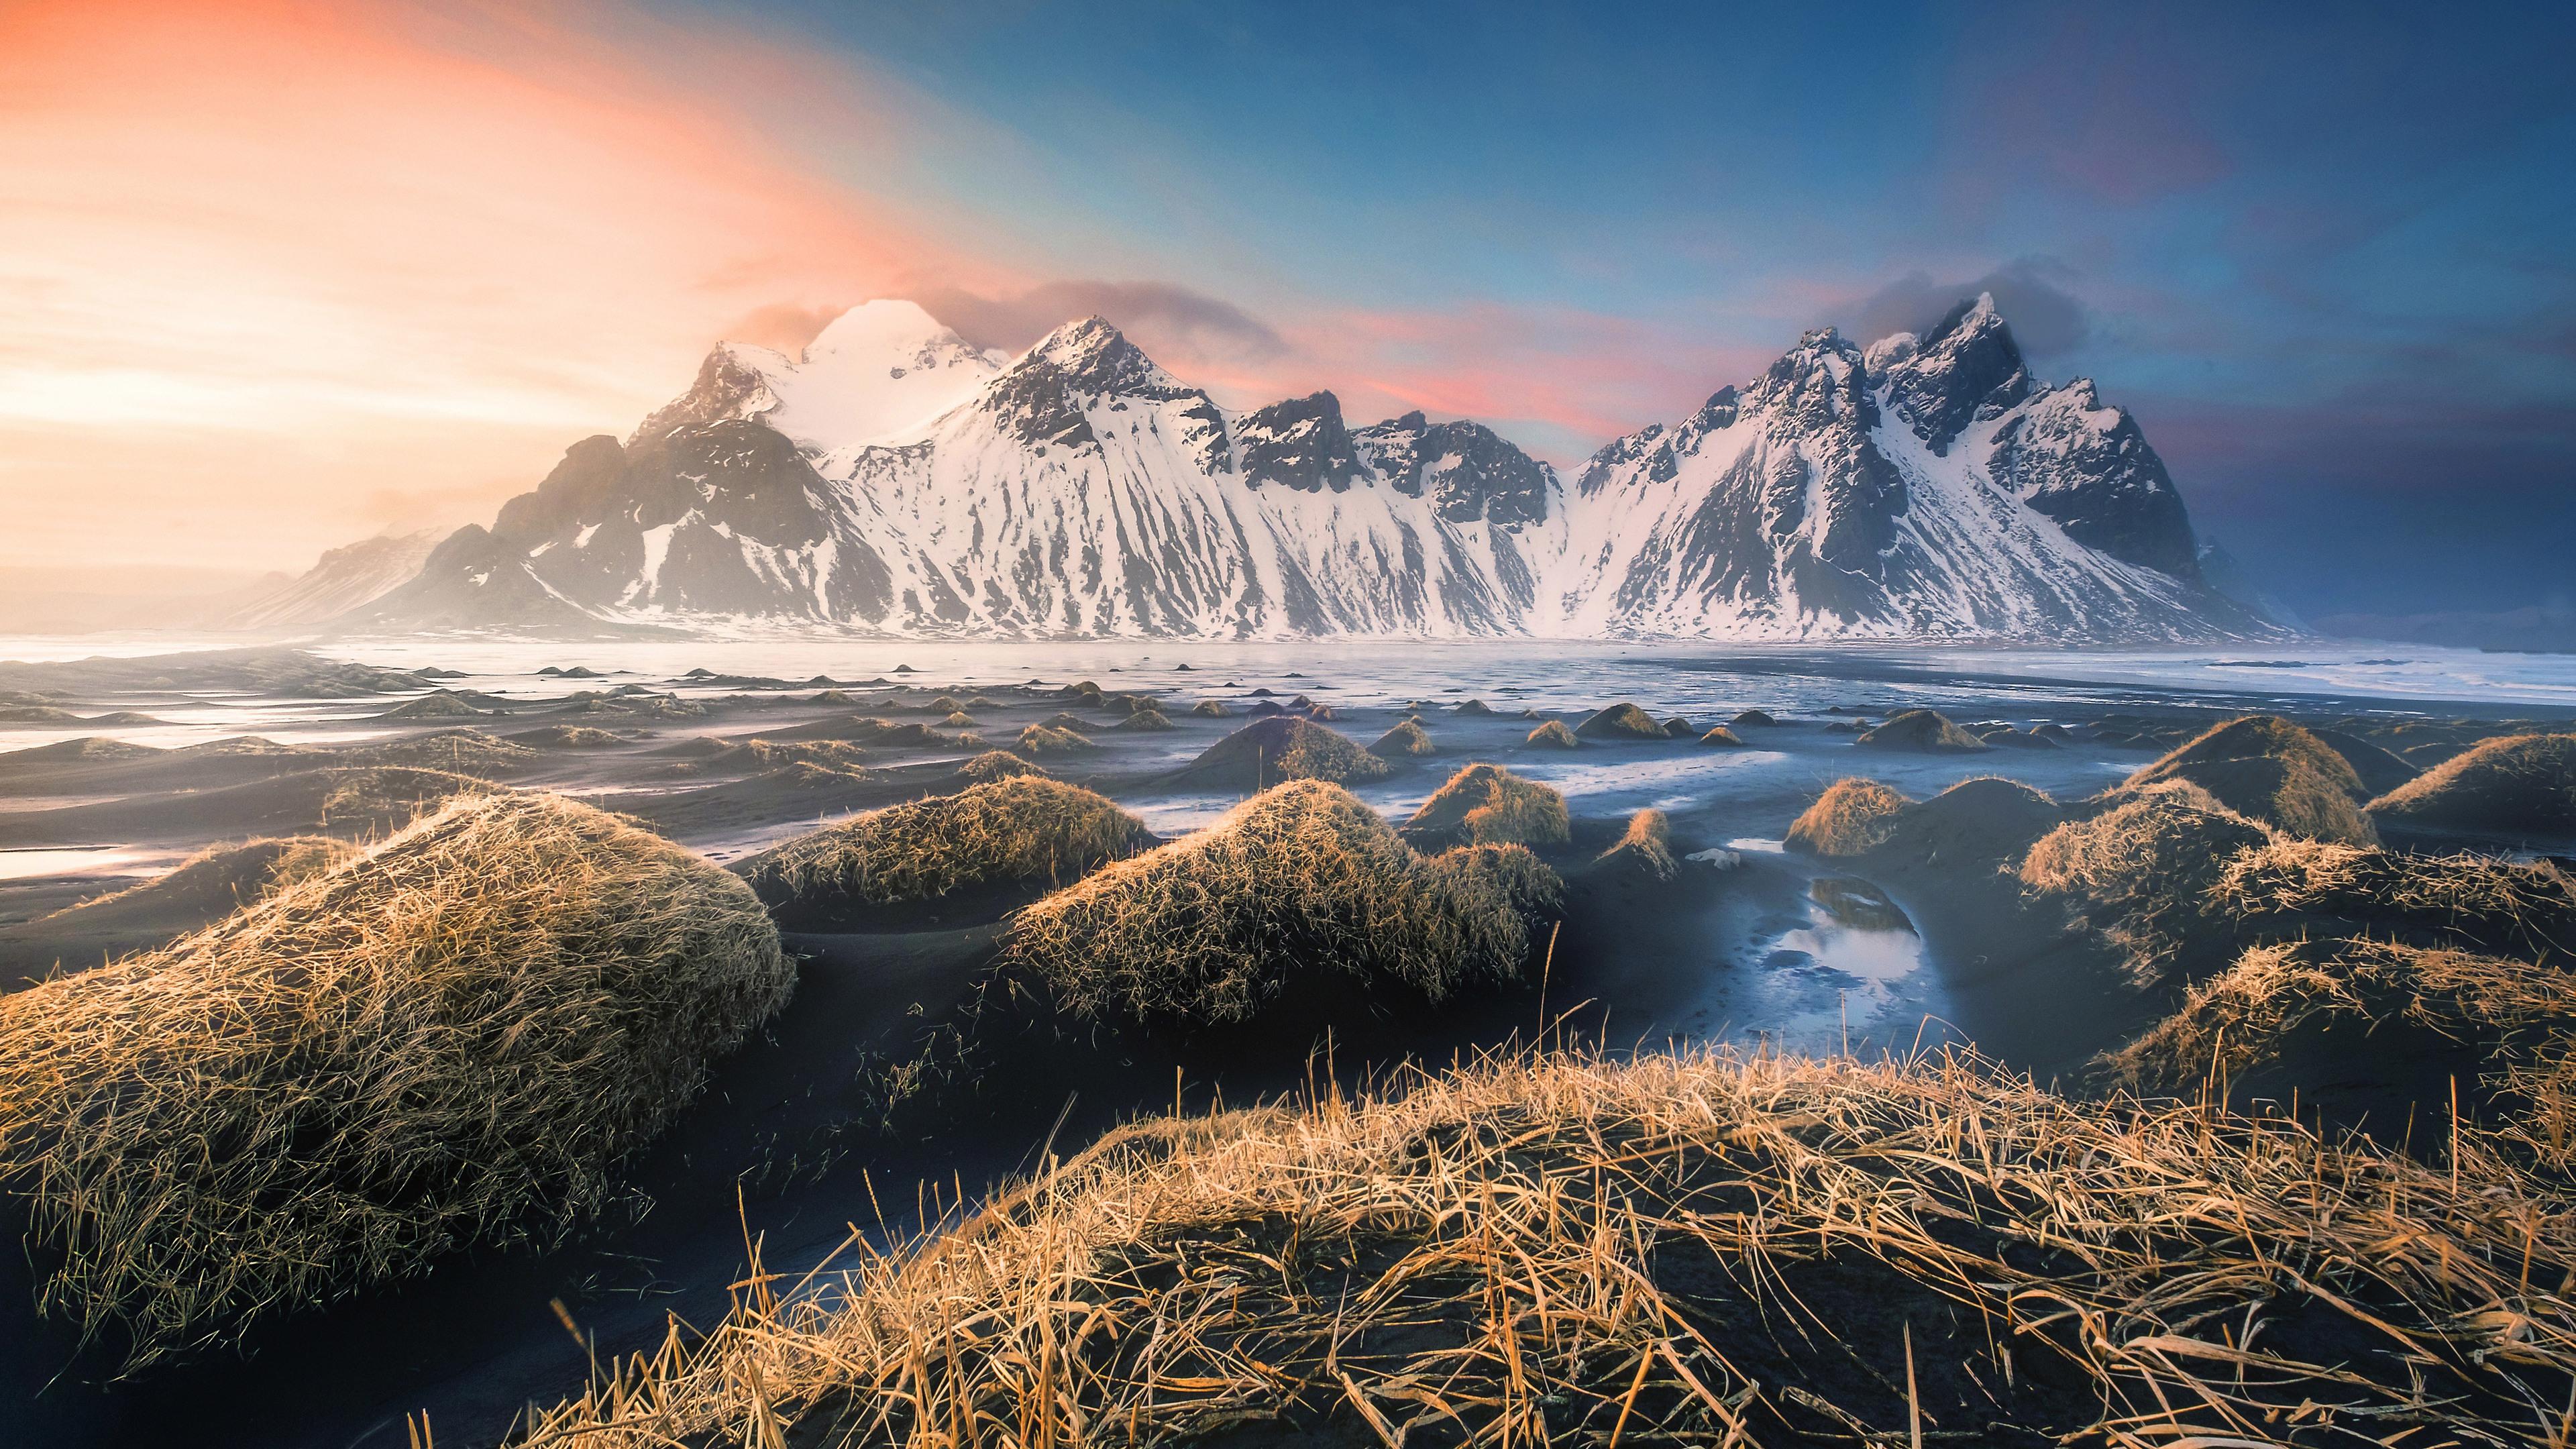 mountains iceland 4k 1540134326 - Mountains Iceland 4k - nature wallpapers, mountains wallpapers, island wallpapers, hd-wallpapers, 4k-wallpapers